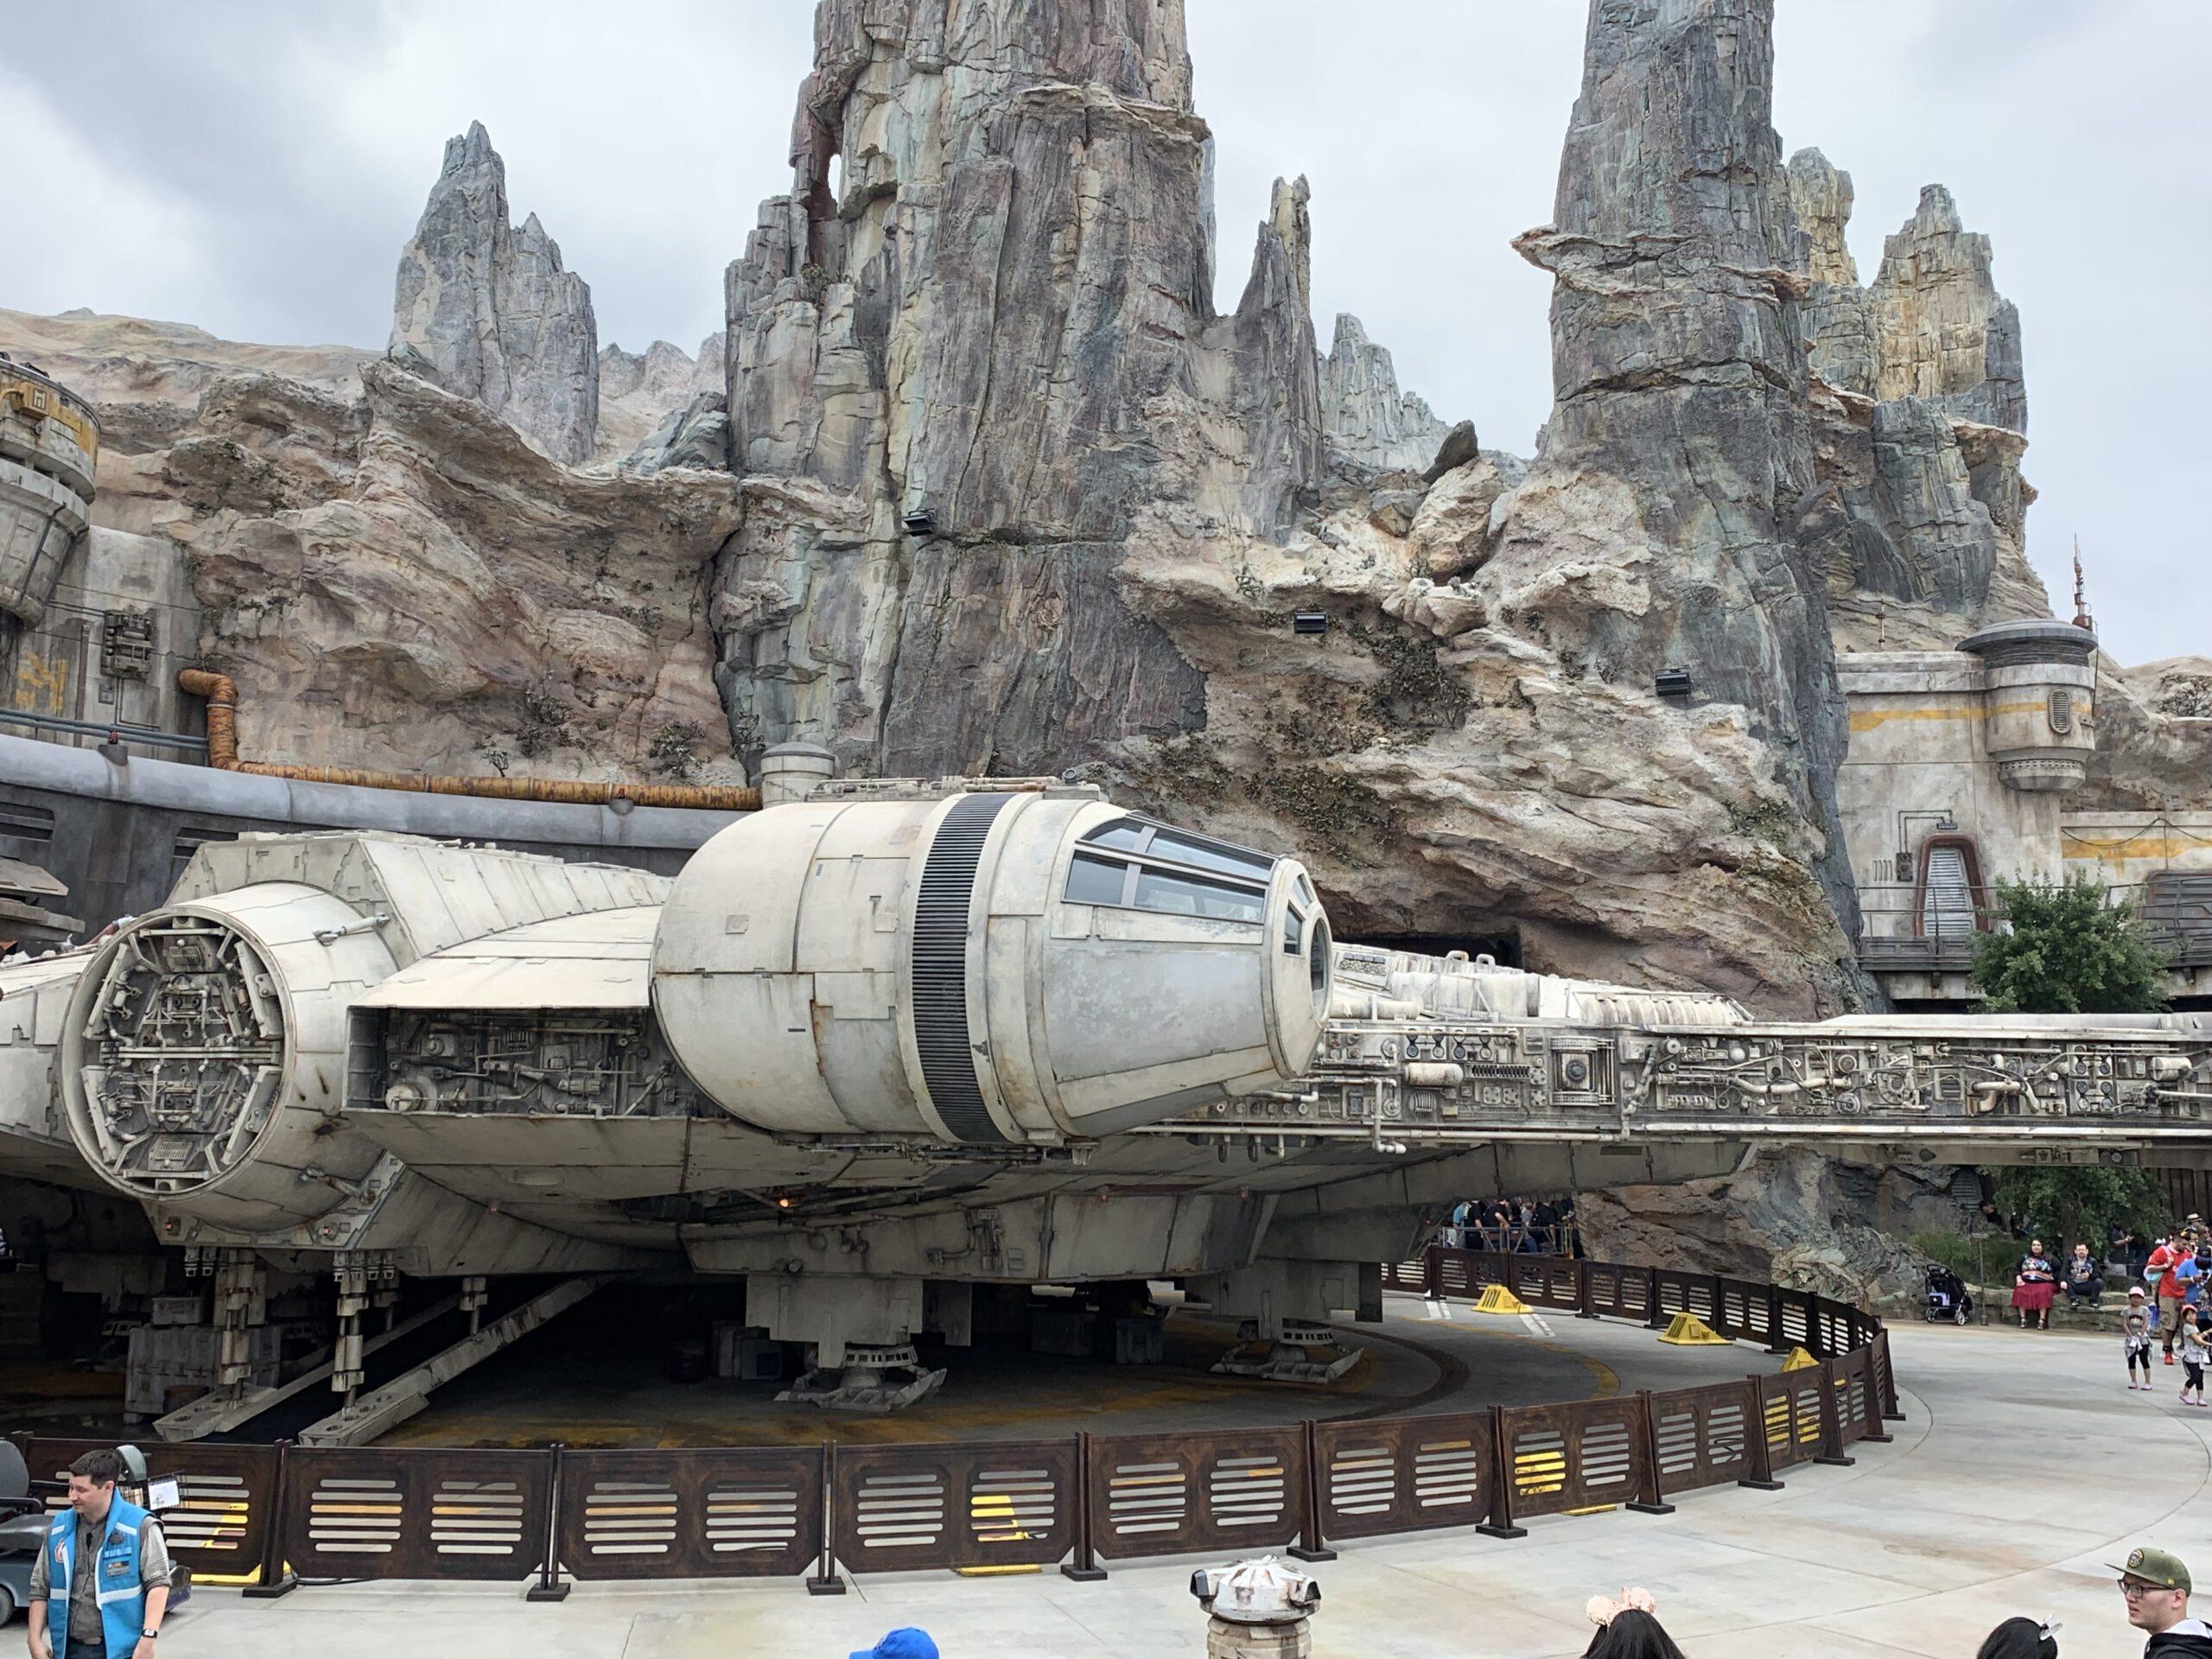 Millennium Falcon at Star Wars: Galaxy's Edge